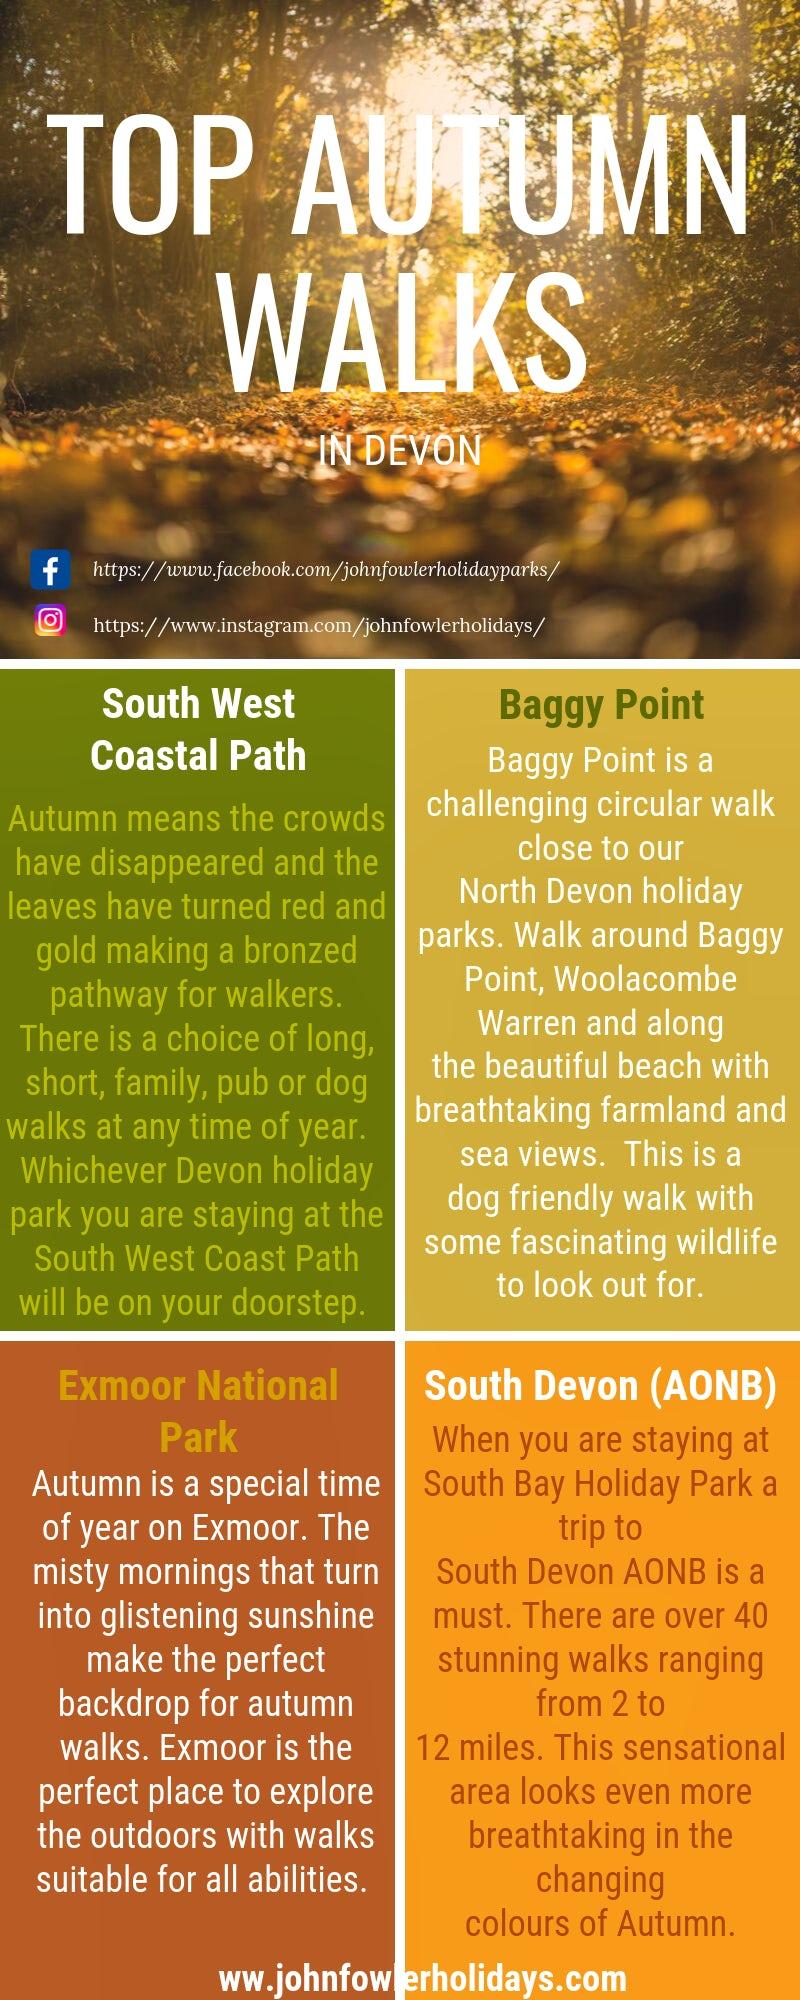 Top Autumn Walks in Devon | John Fowler Holidays Infographic